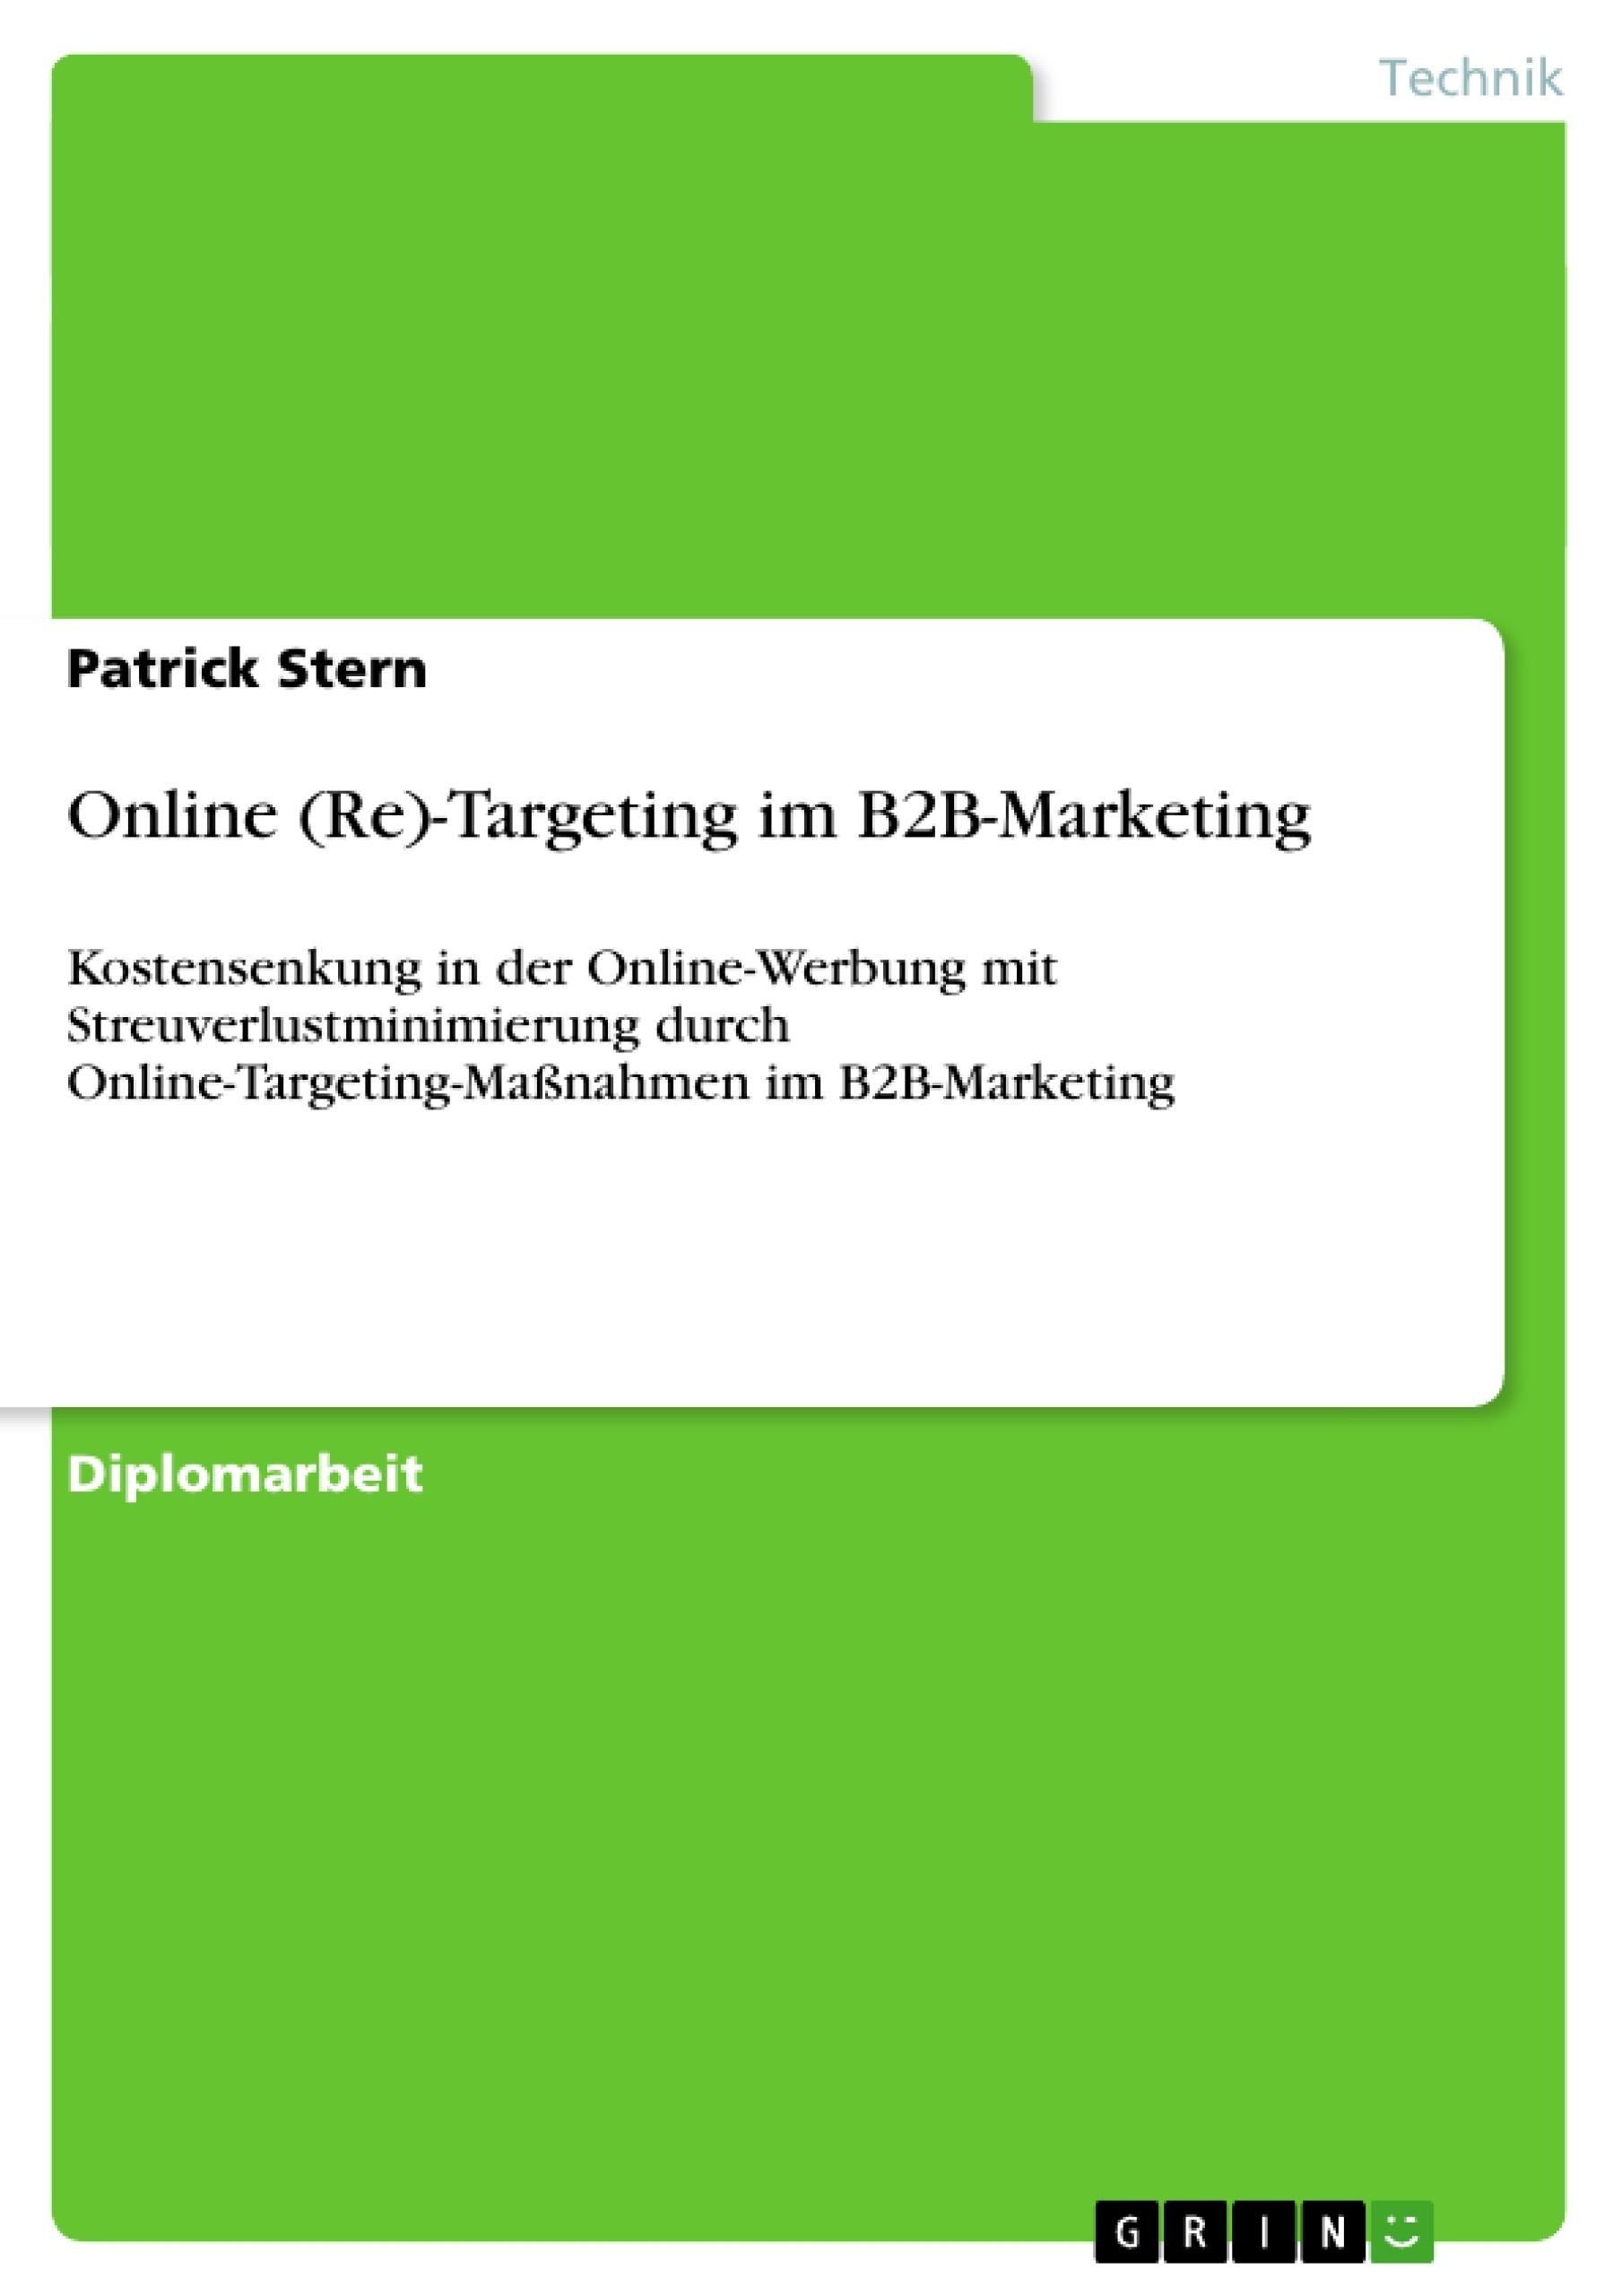 Titel: Online (Re)-Targeting im B2B-Marketing